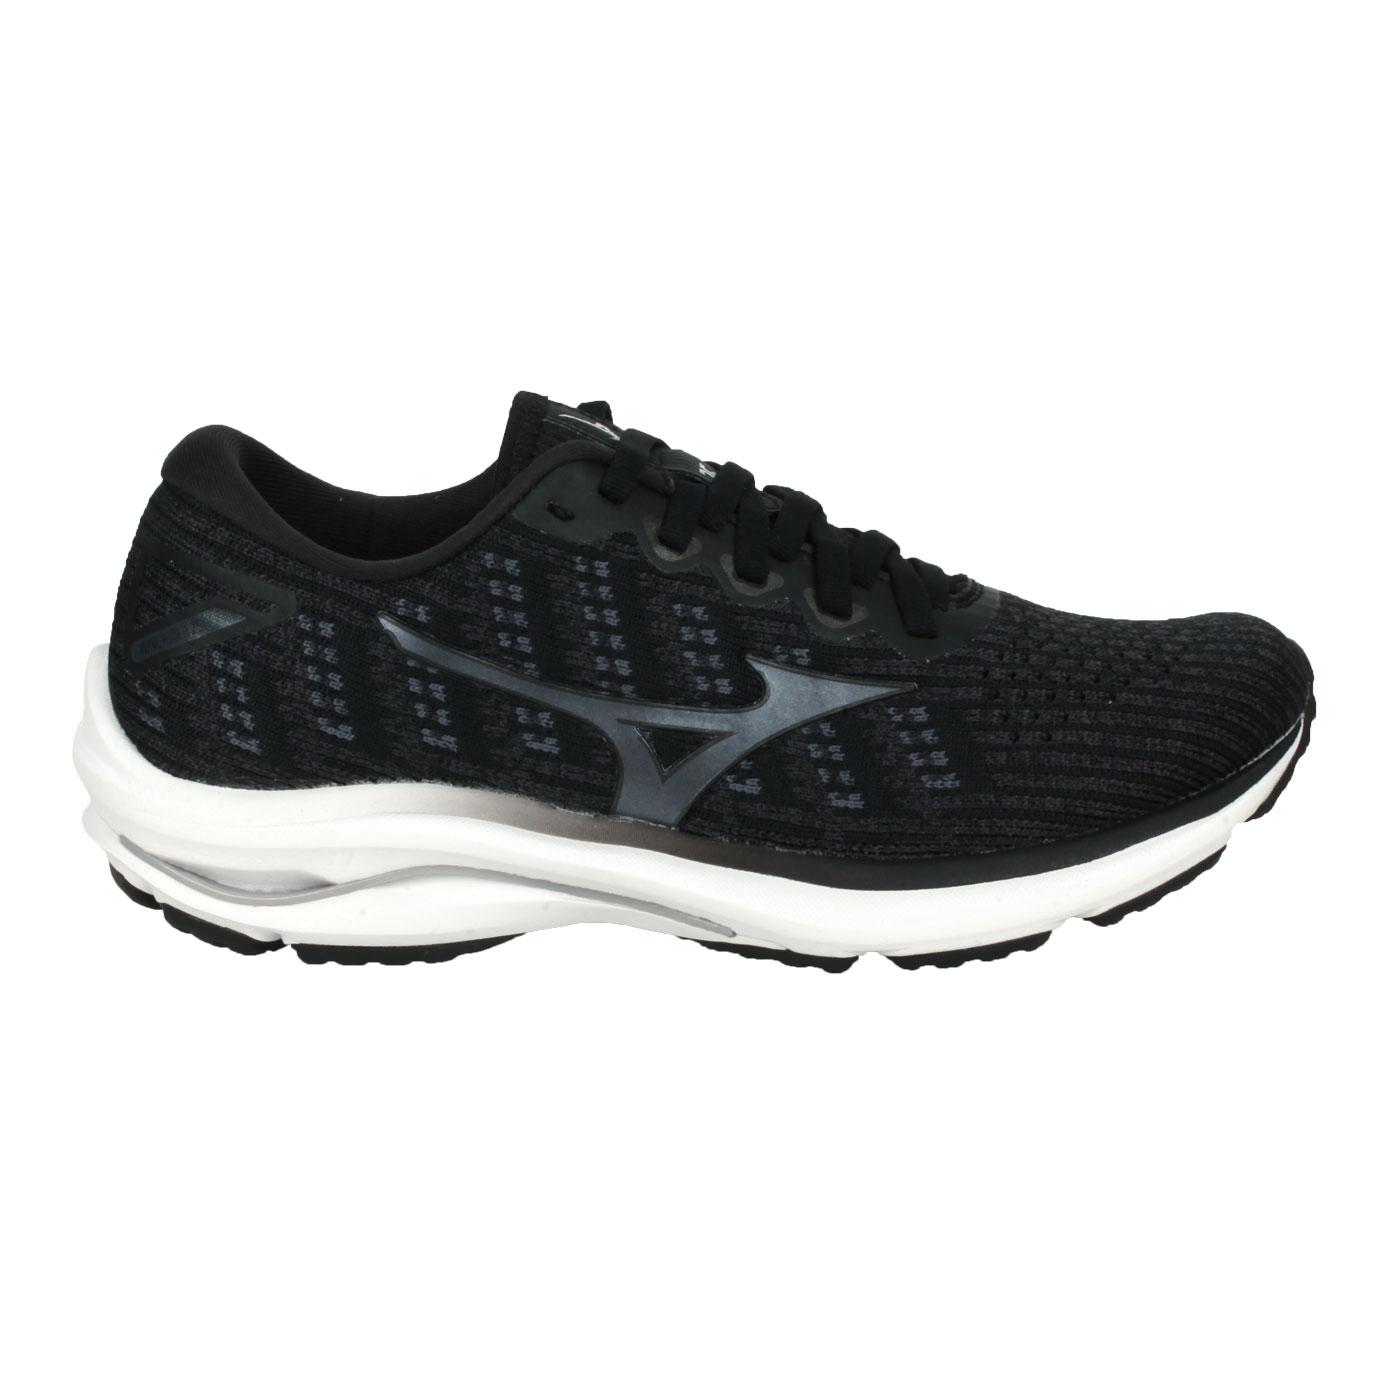 MIZUNO 女款慢跑鞋  @WAVE RIDER 25 WAVEKNIT@J1GD217590 - 黑灰